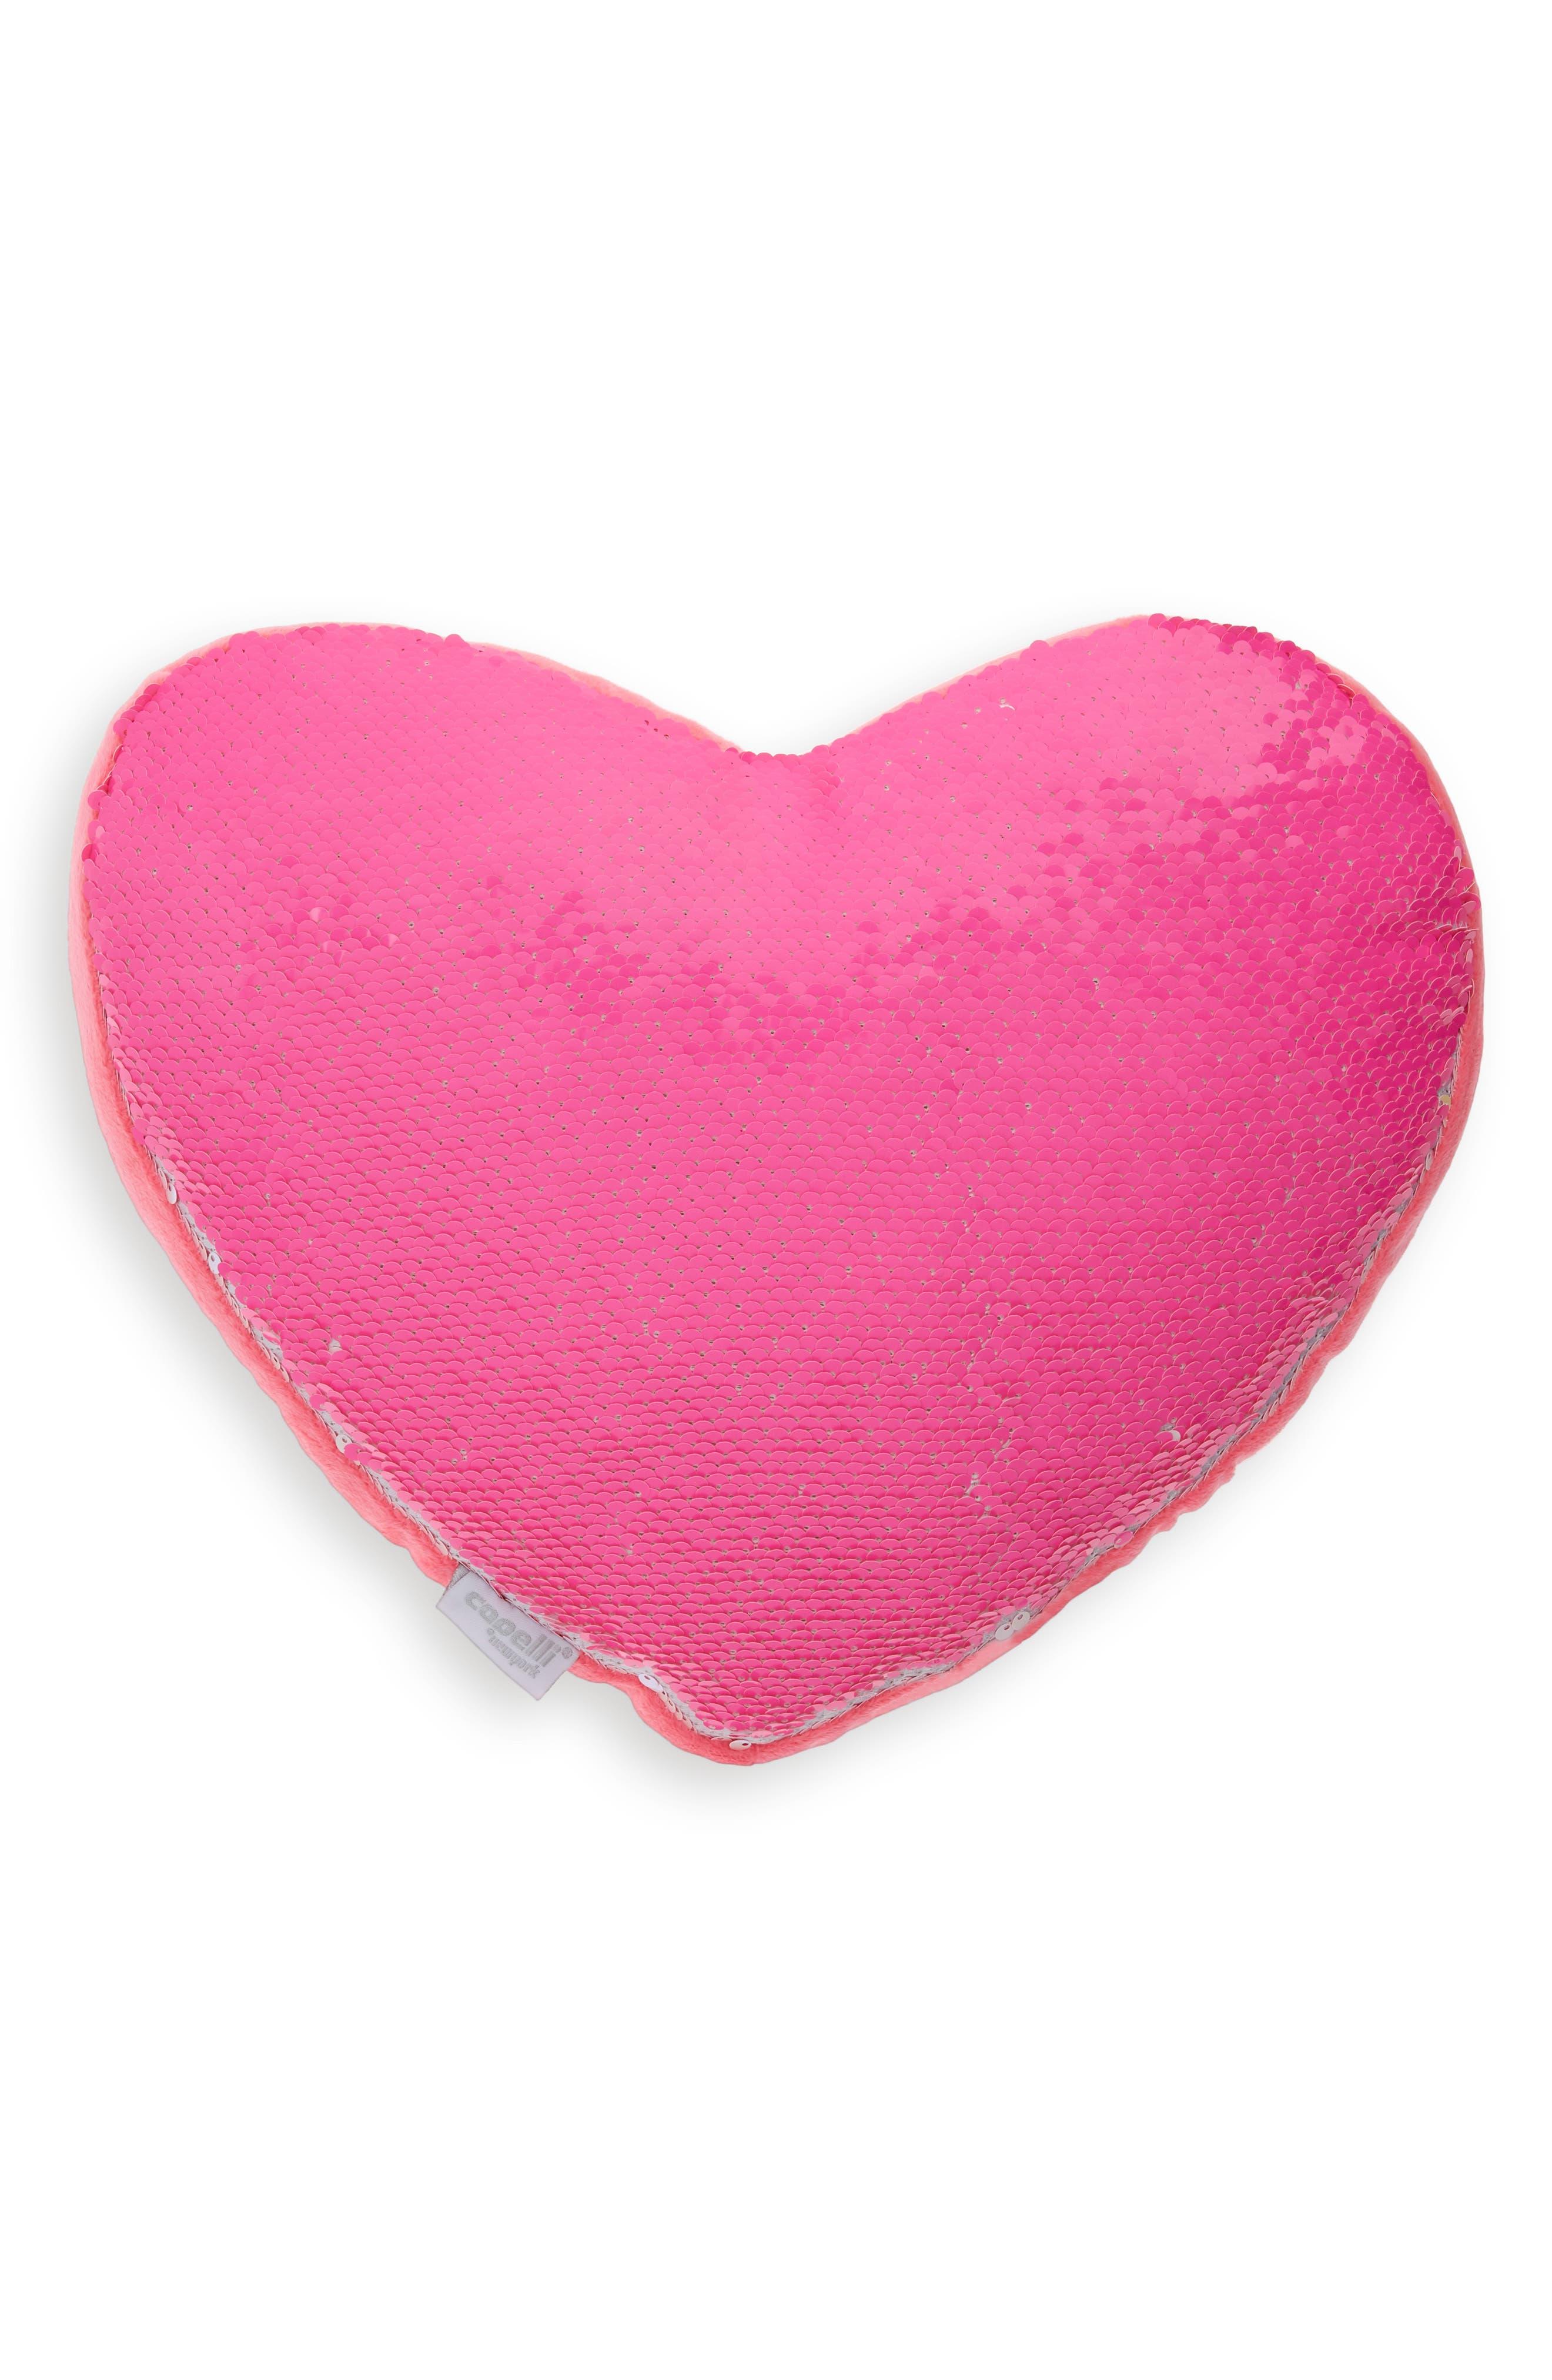 CAPELLI NEW YORK,                             Reversible Sequin Heart Pillow,                             Main thumbnail 1, color,                             PINK COMBO